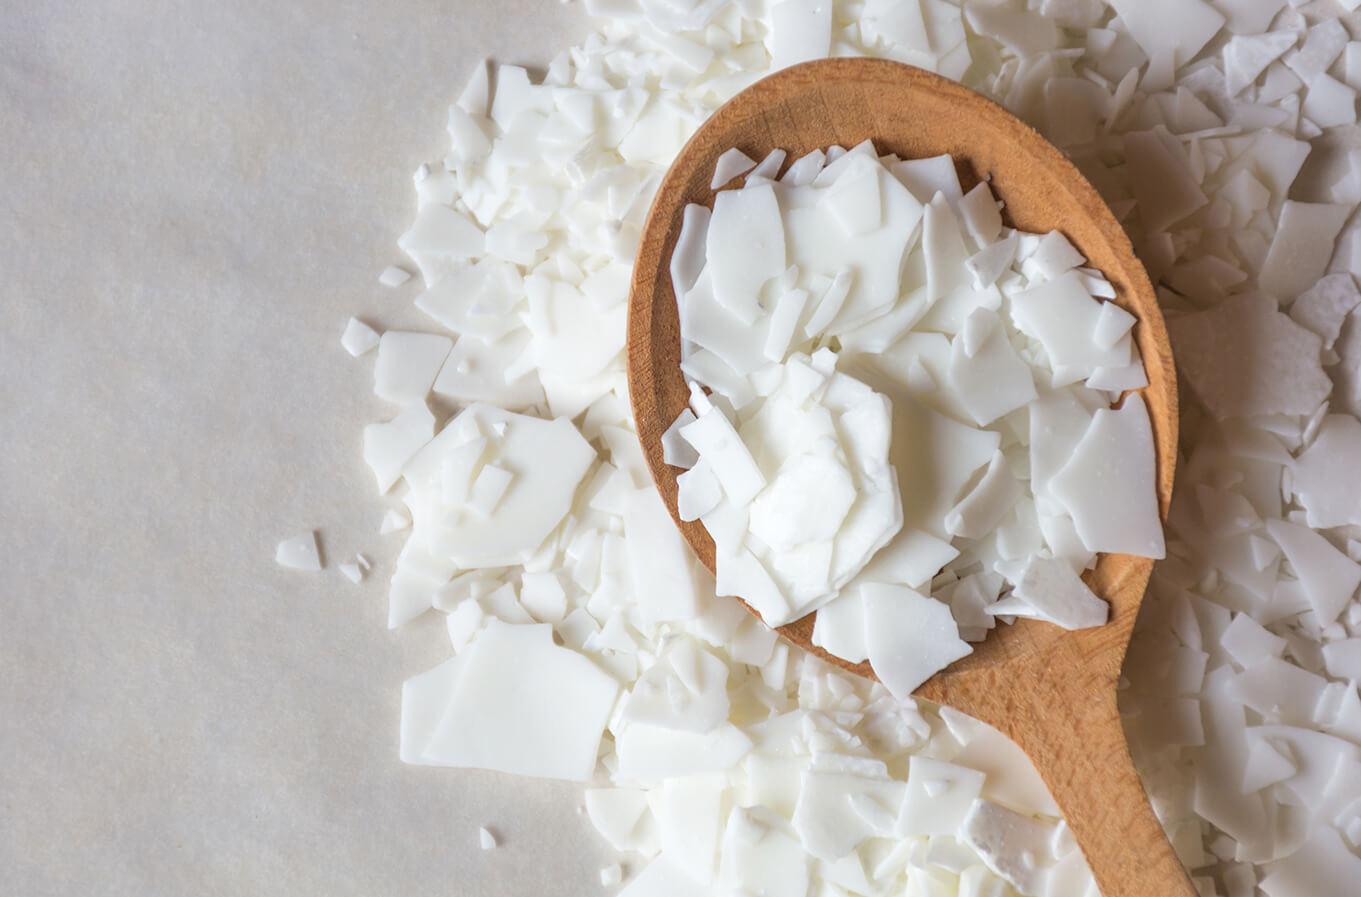 ADC fournisseur de cire de soja soy wax provider